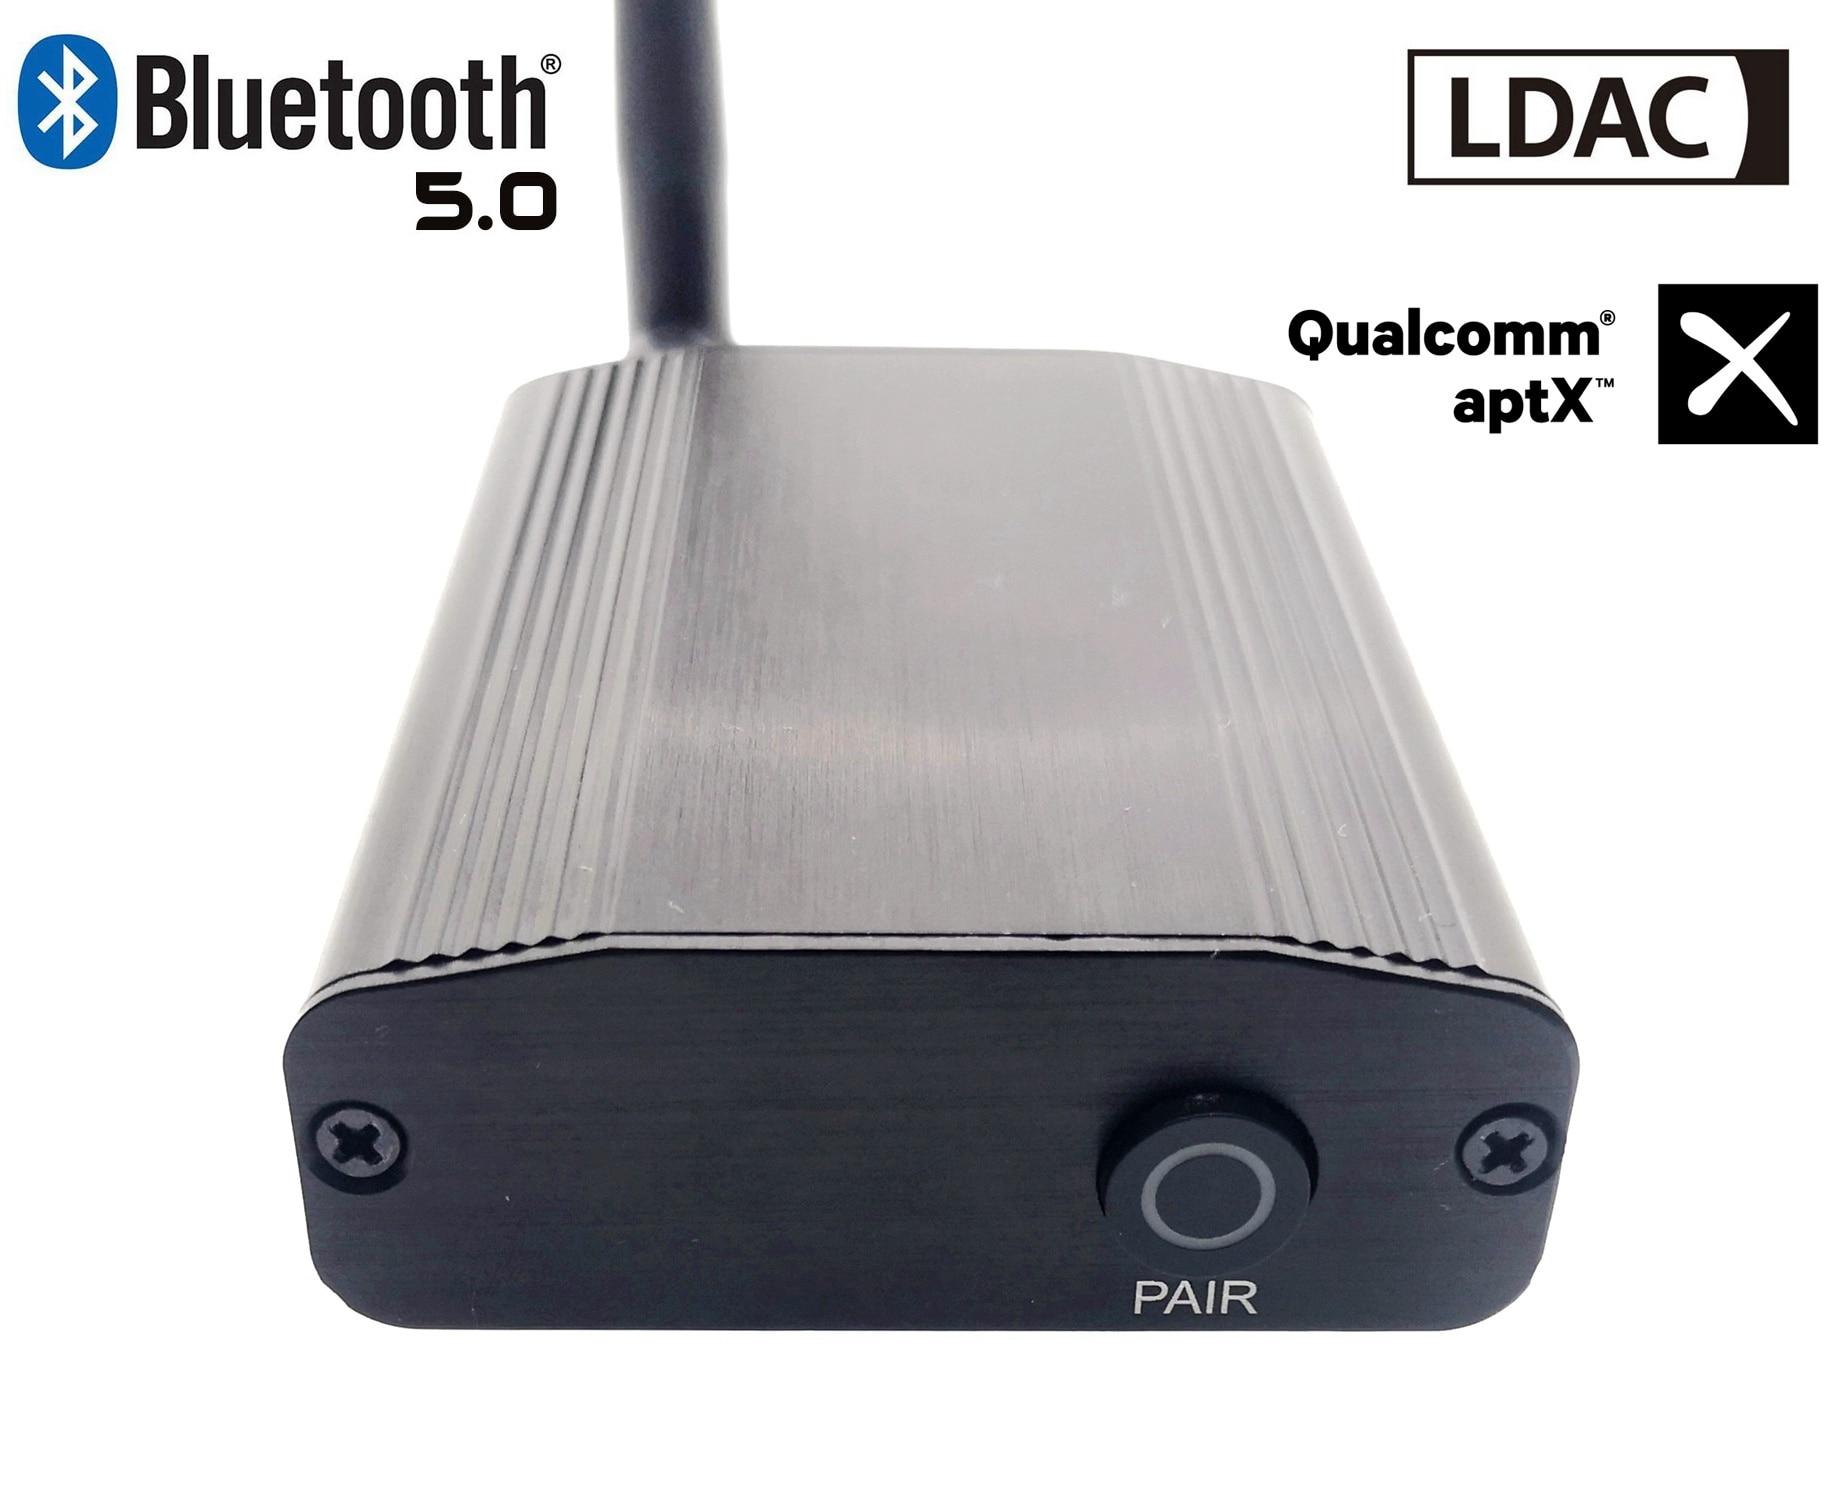 LDAC50 CSR8675-V5.0 Bluetooth tecnología LDAC aptx para 24bit/96khz Coaxial de Audio Digital óptico receptor de Audio Bluetooth 5,0